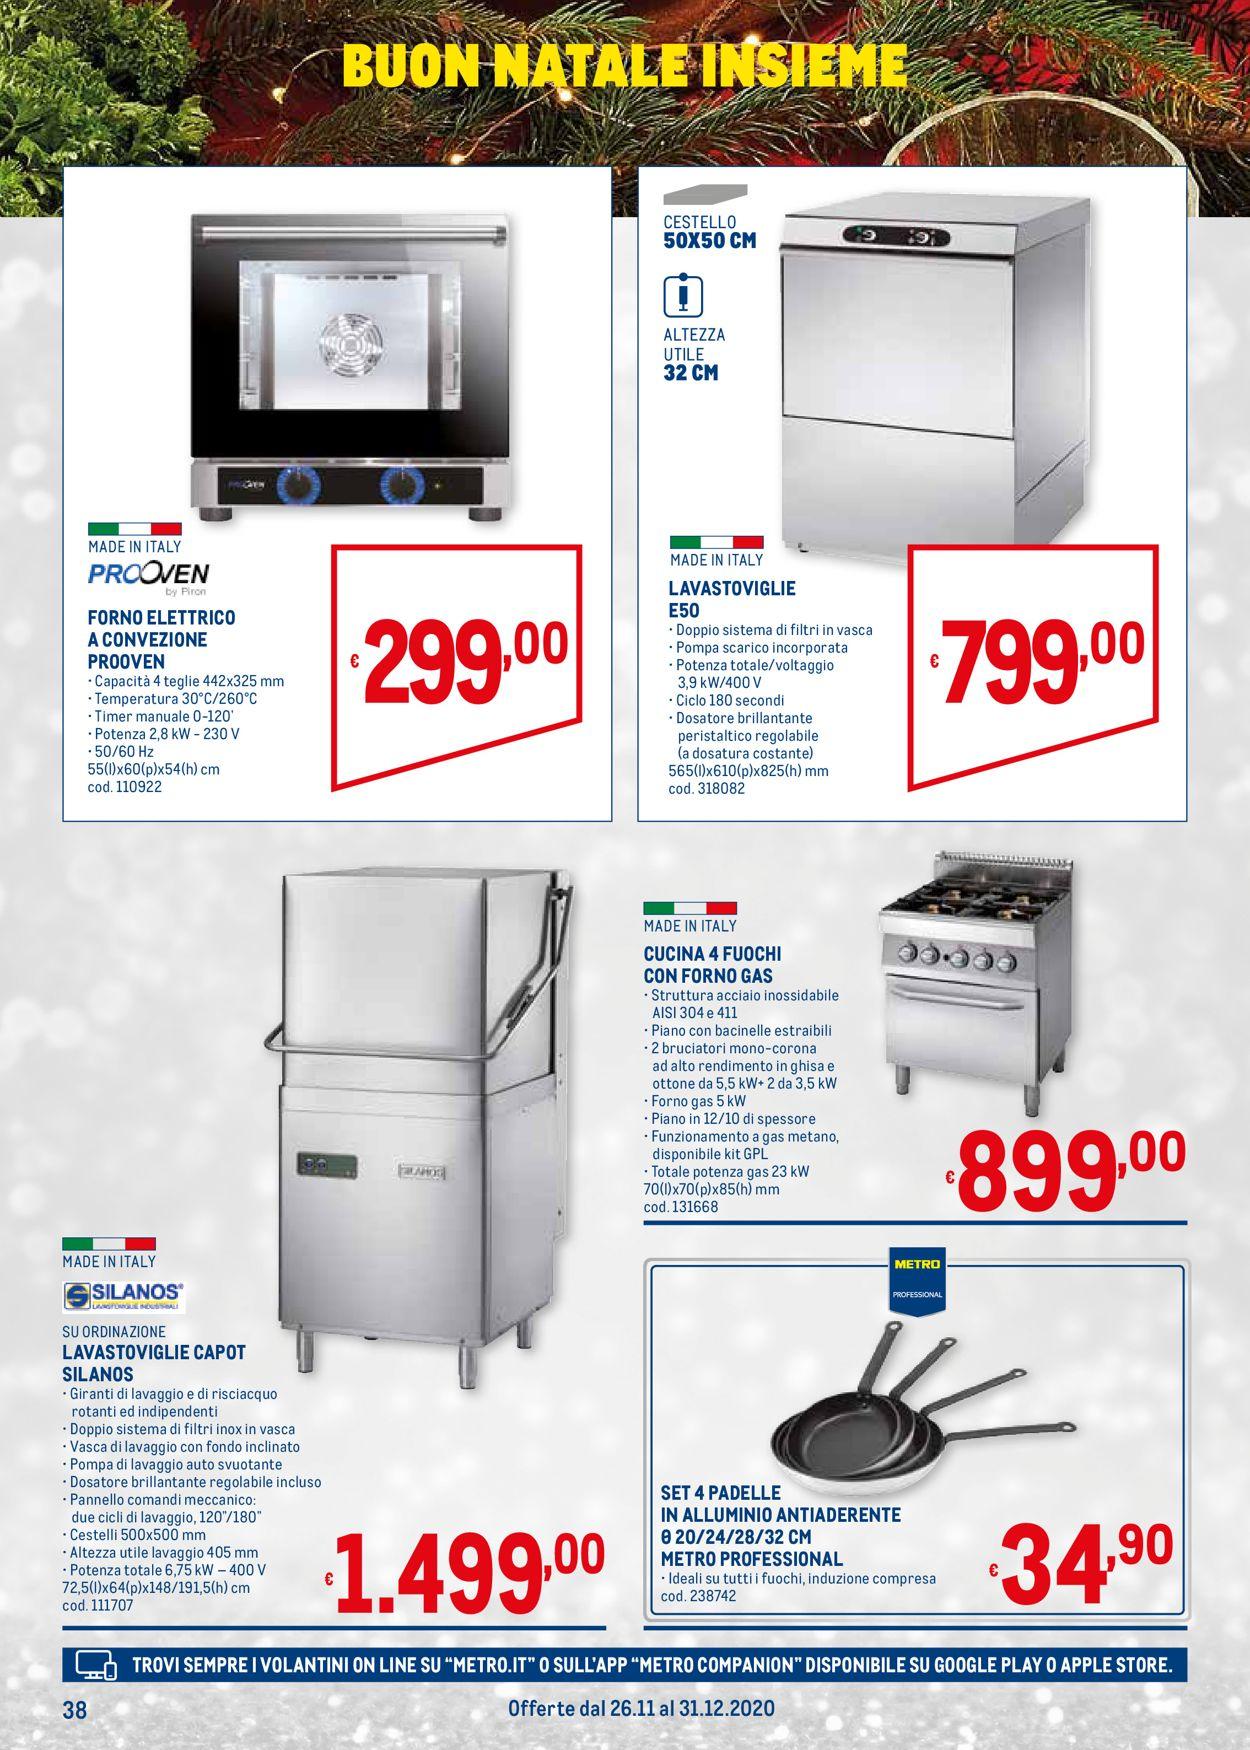 Volantino Metro - Natale 2020 - Offerte 26/11-31/12/2020 (Pagina 38)